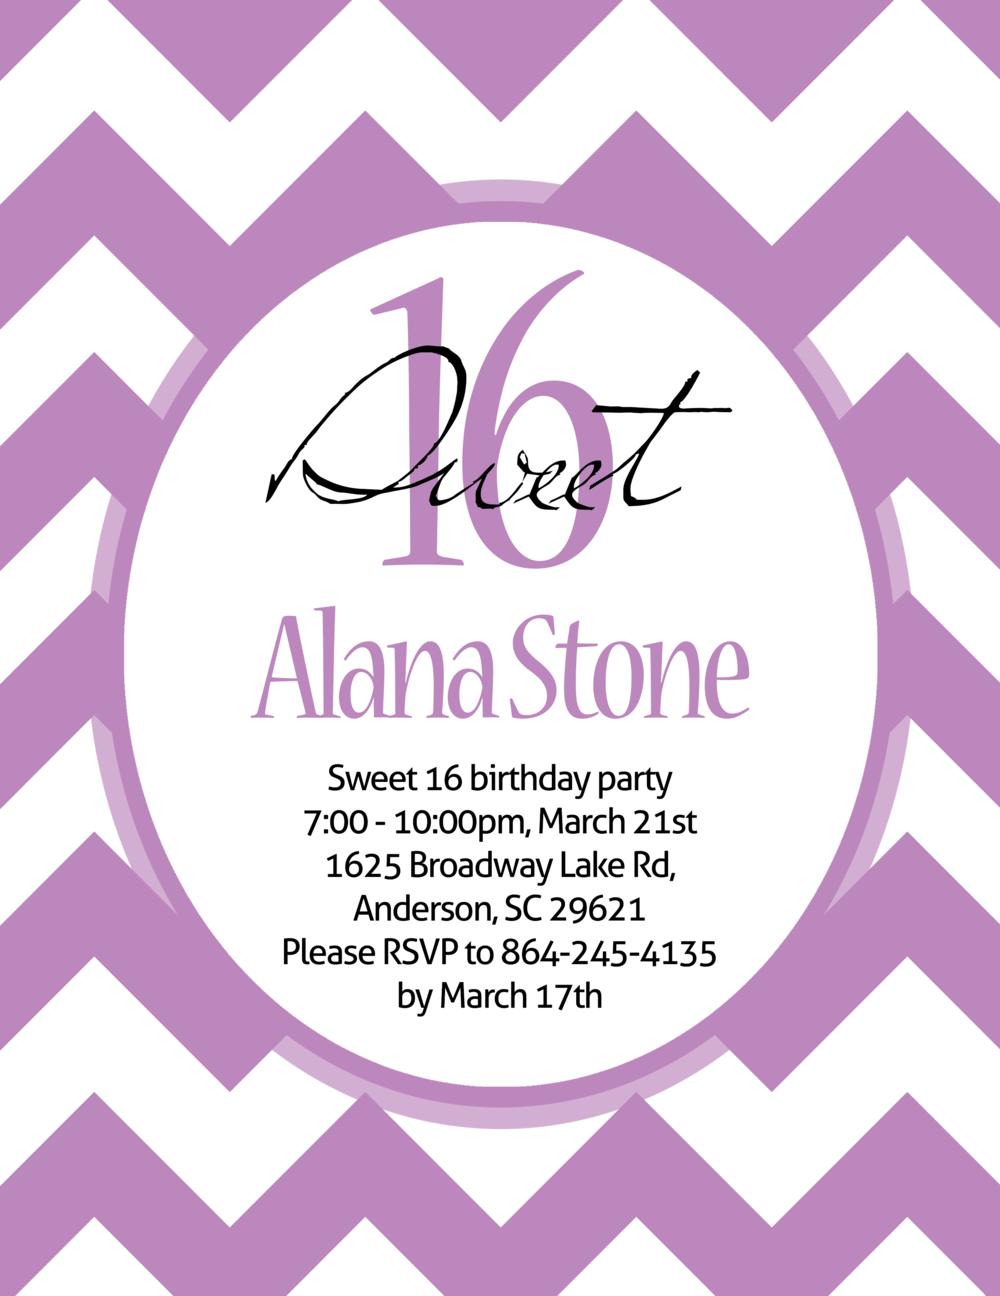 Alana_BDAY_INVITE2.png